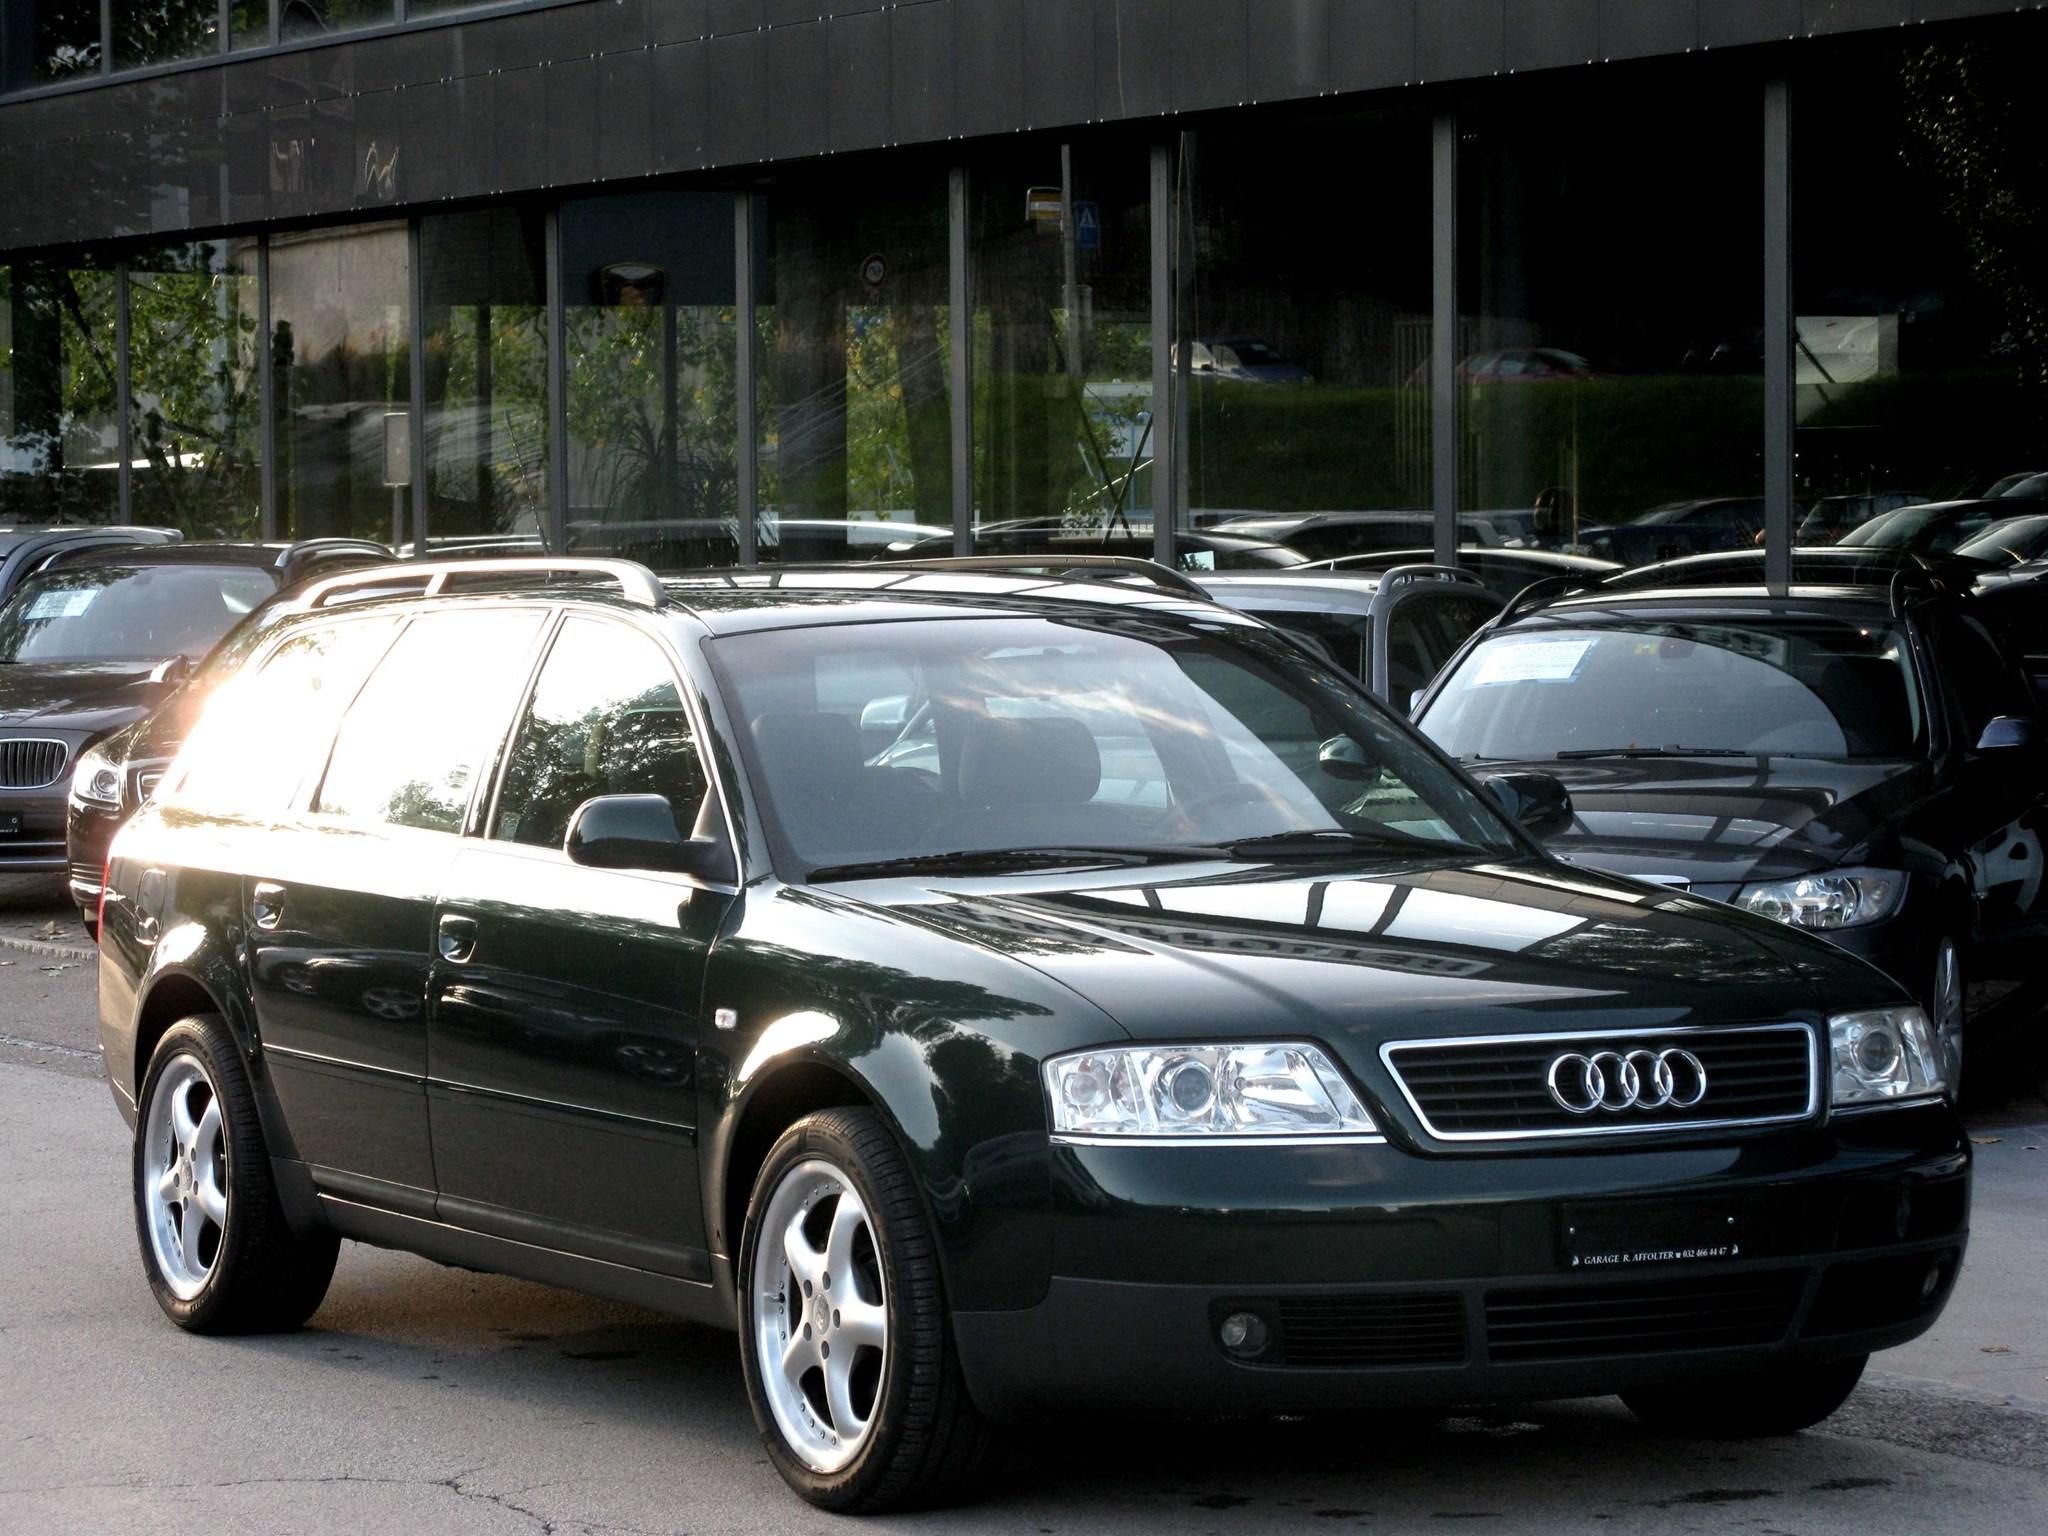 estate Audi A6 Avant 2.4 V6